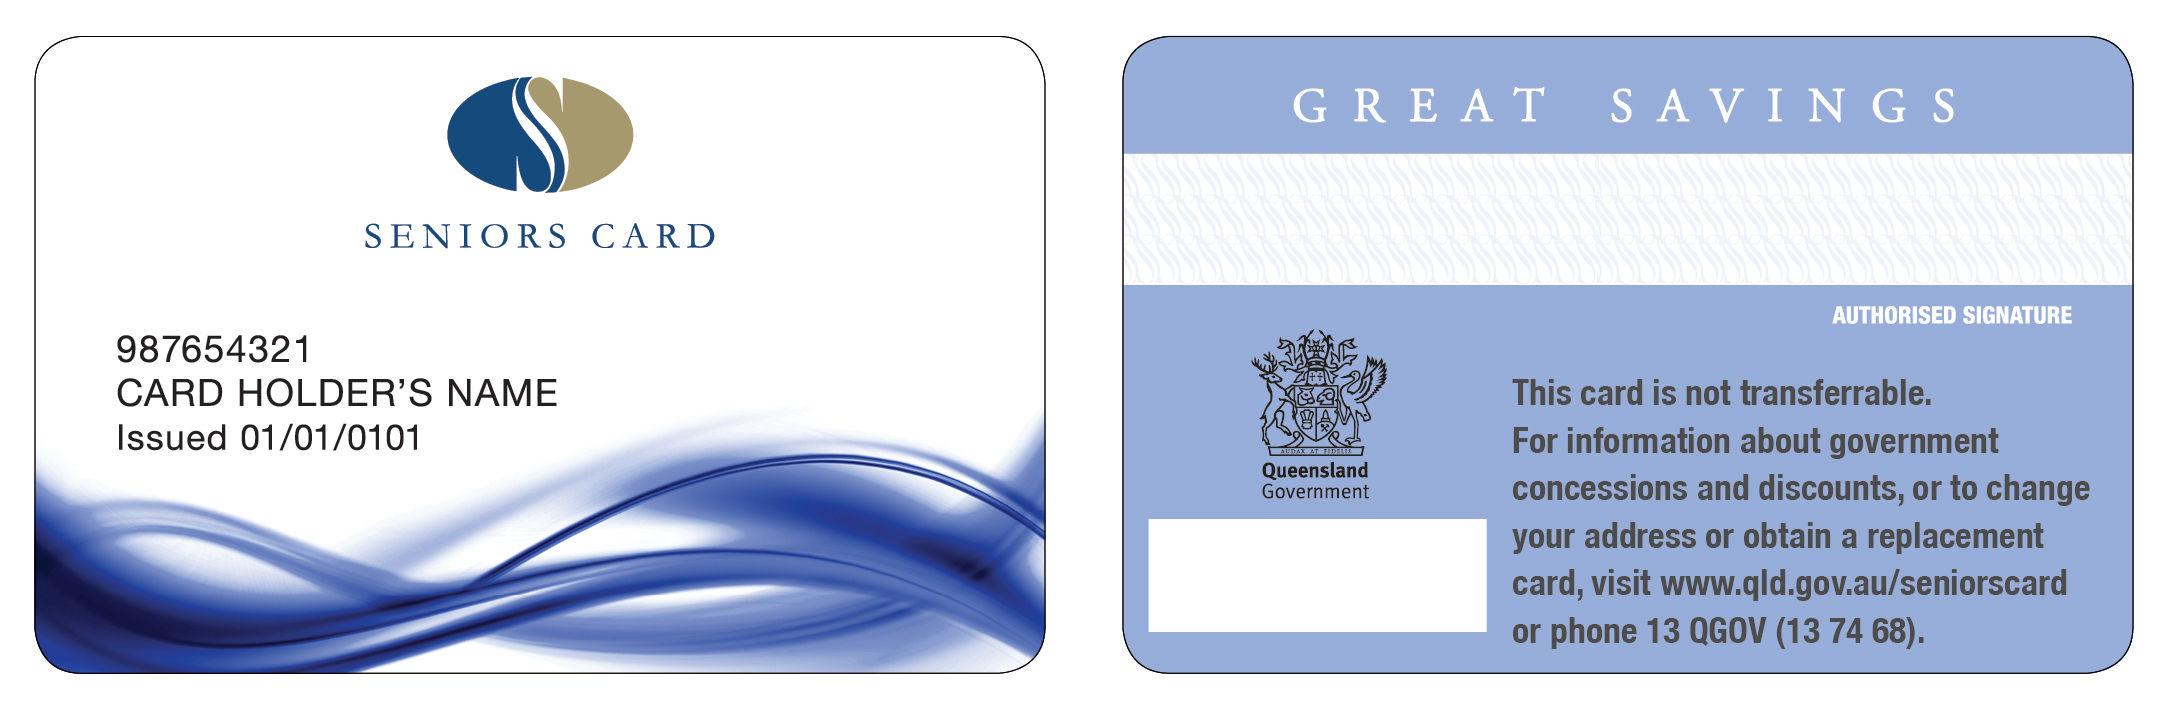 Apply for Seniors Card | Seniors | Queensland Government